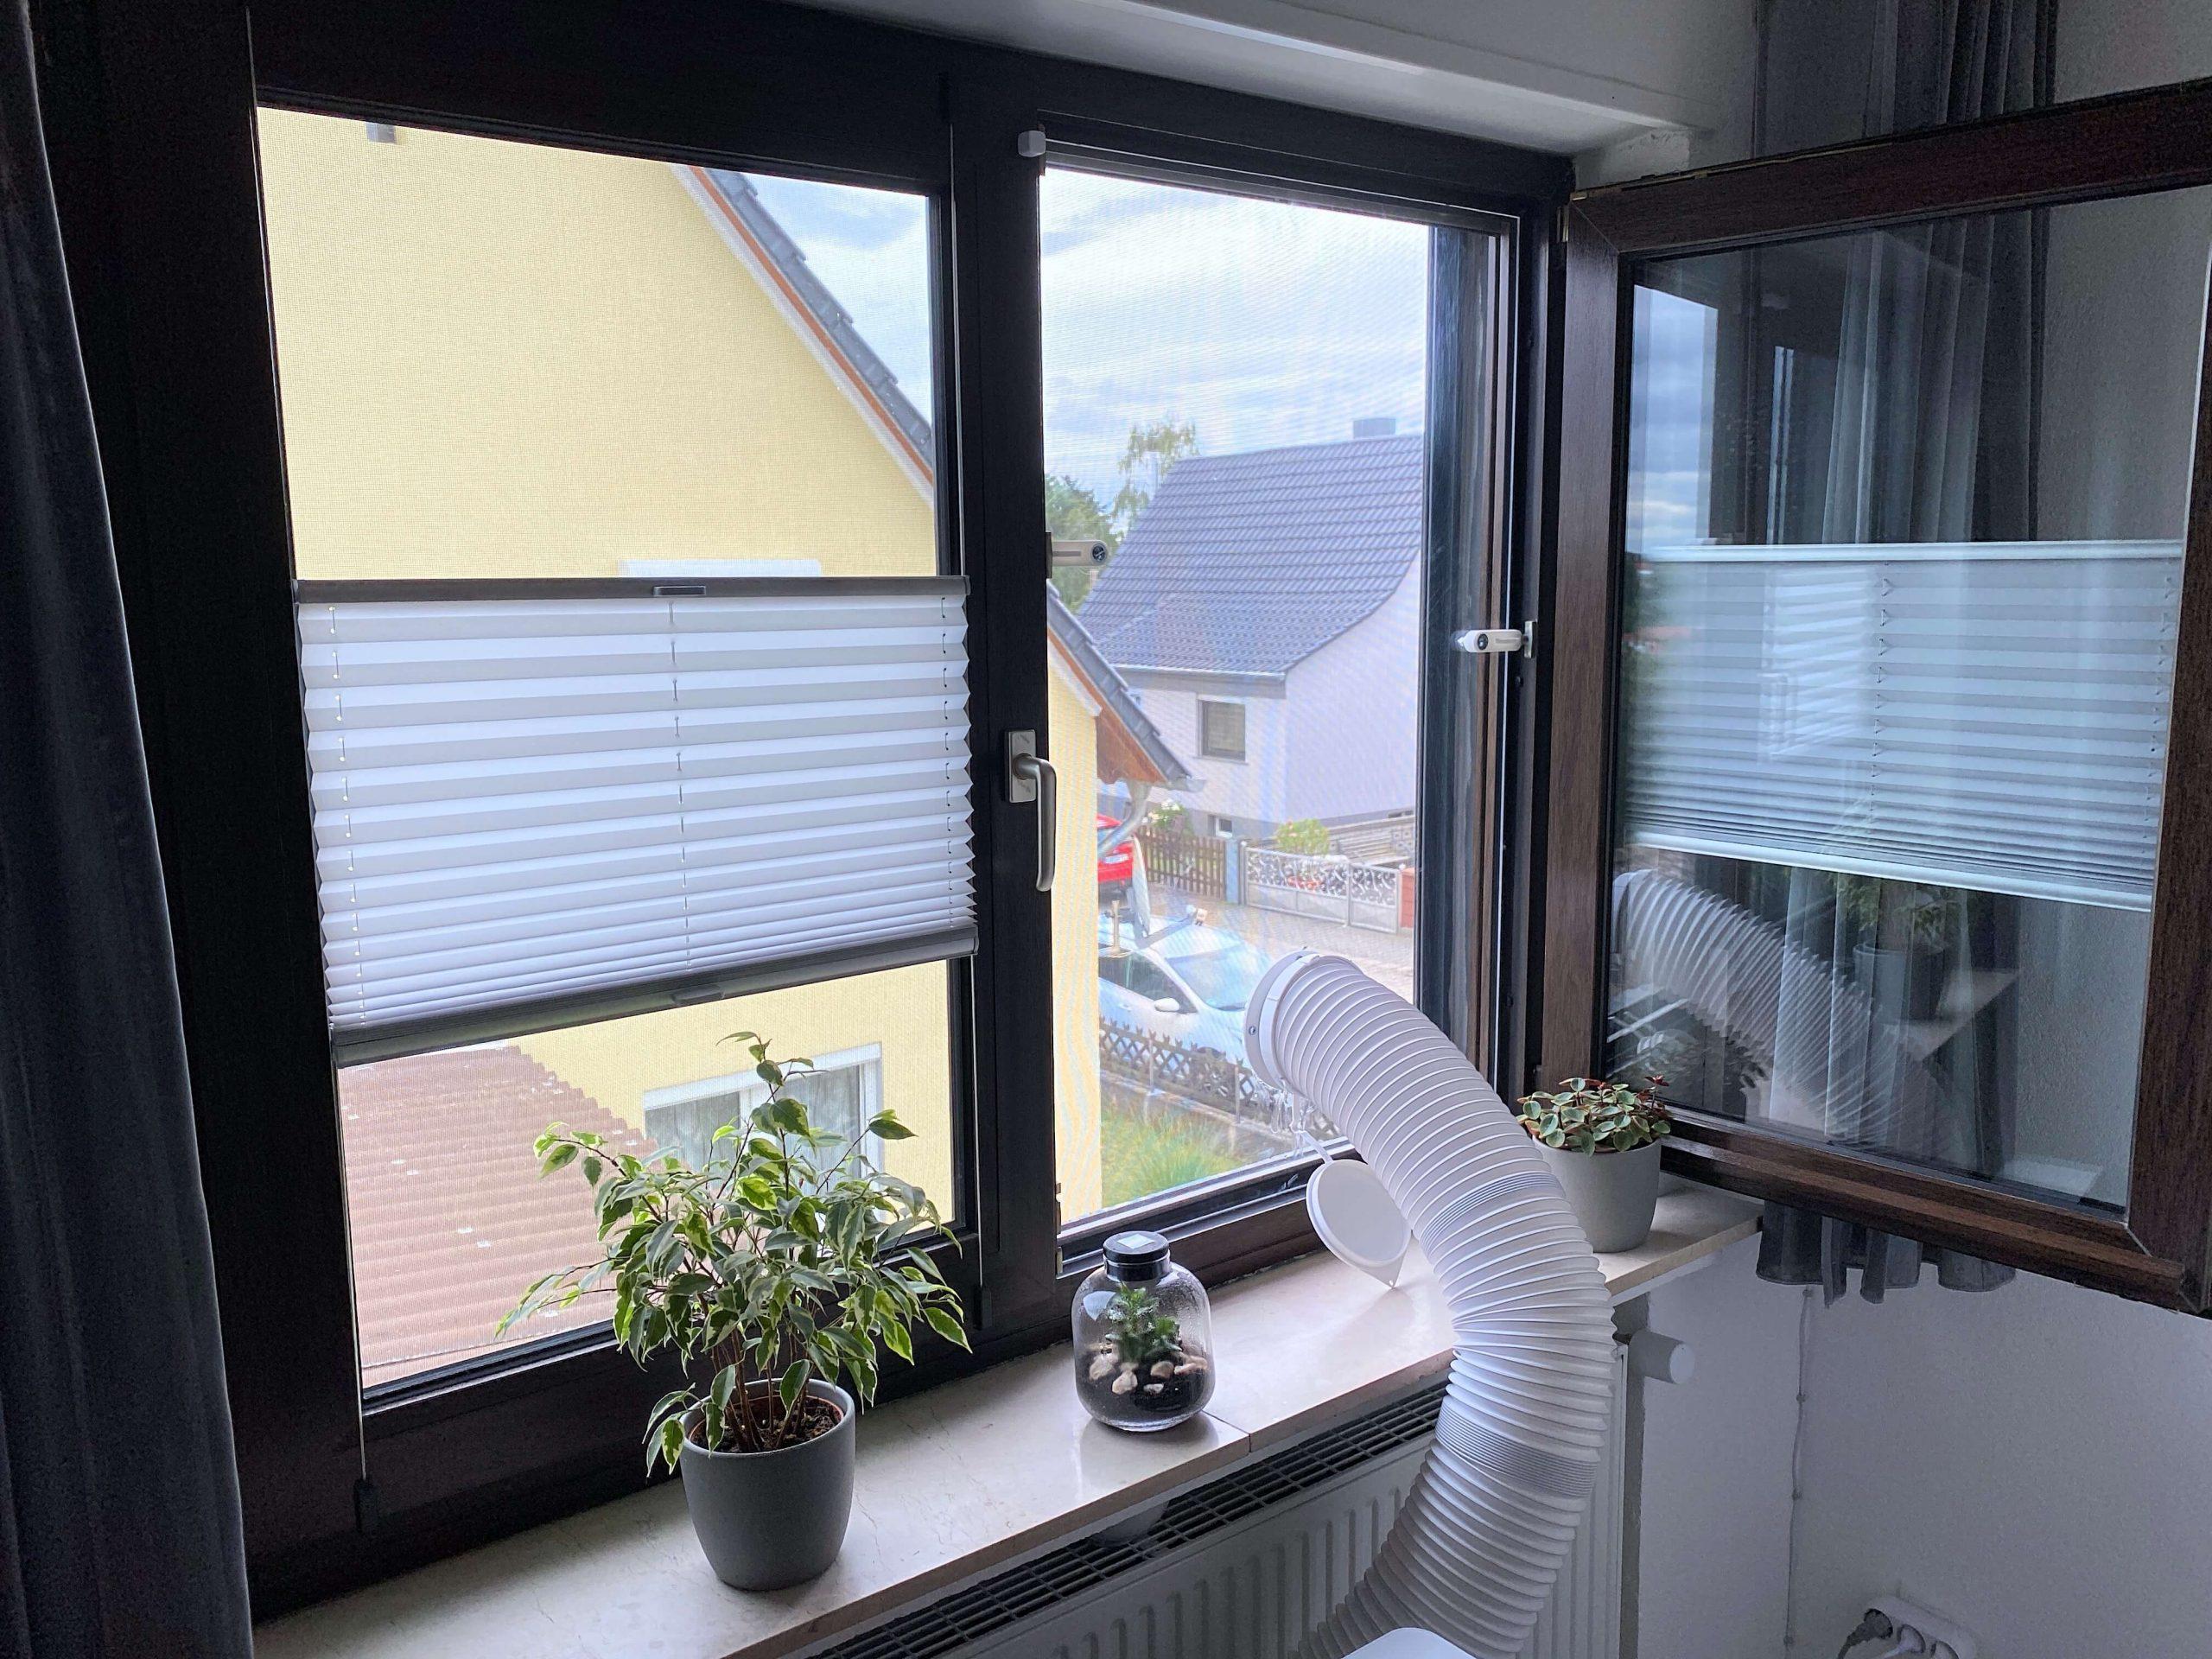 "Projekt-22kühler-Sommer22-Klimaanlagensteuerung-via-Apple-HomeKit-von-tado8-scaled Projekt ""kühler Sommer"" - Apple HomeKit Klimaanlagensteuerung von tado"